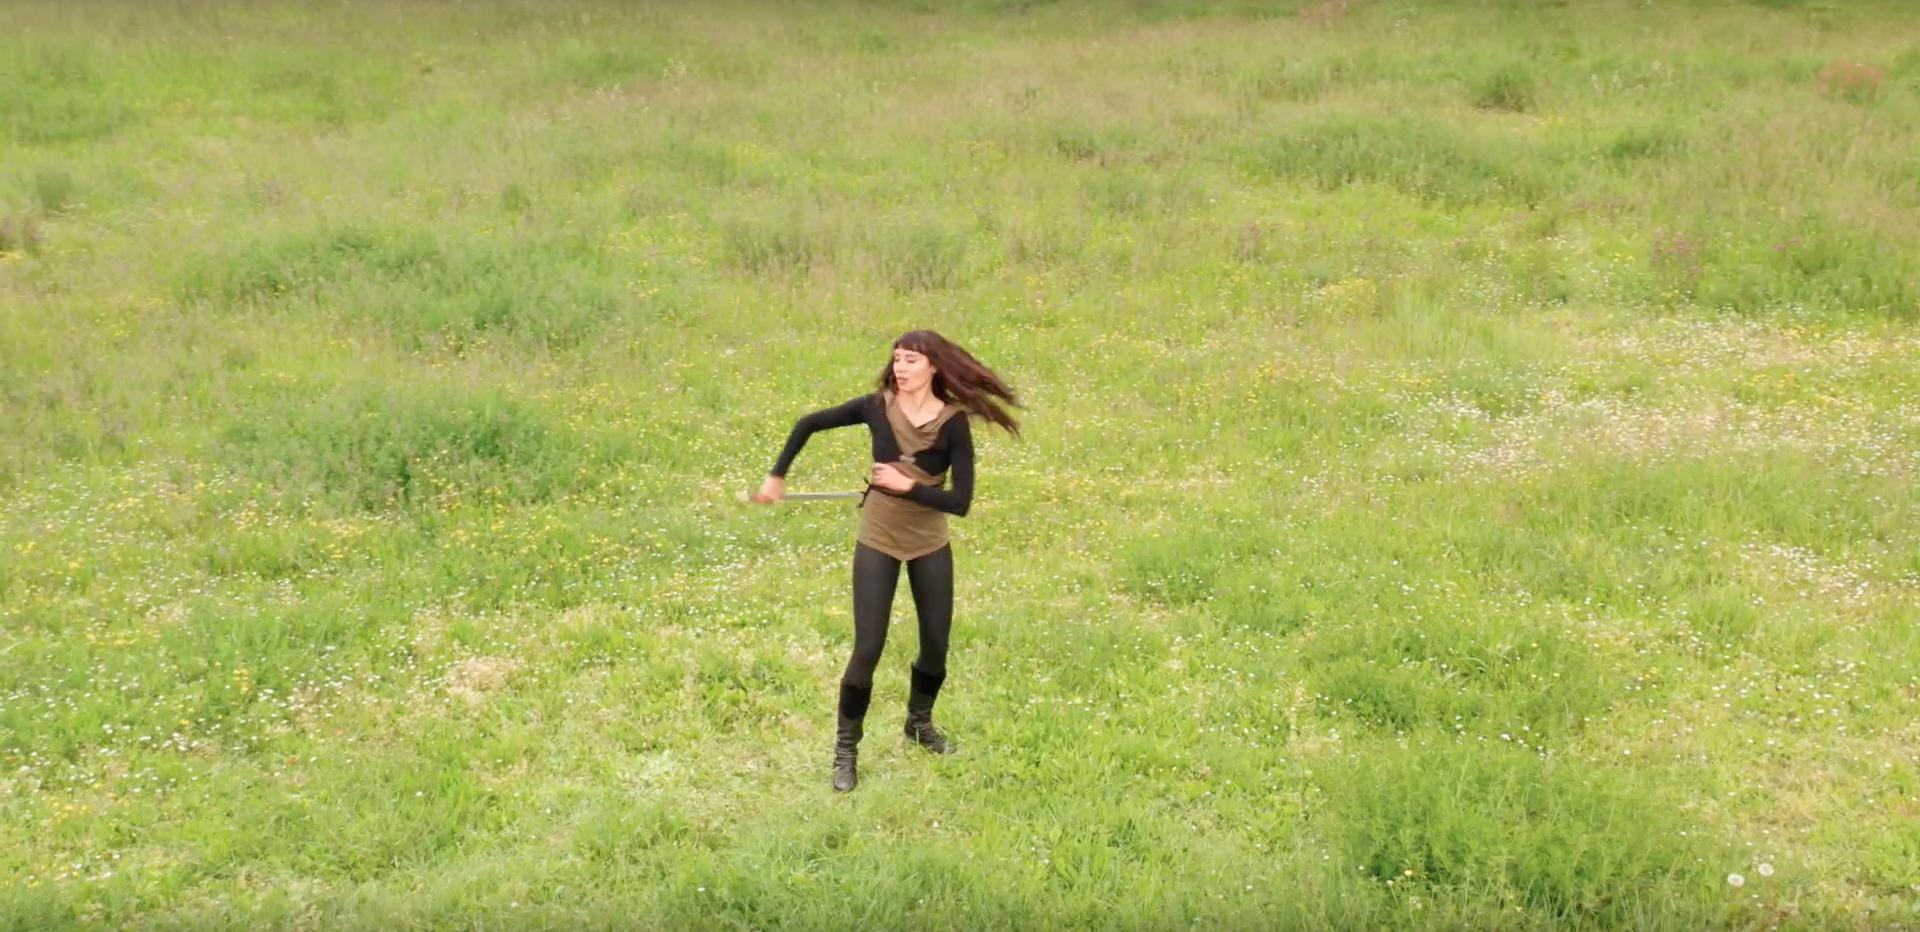 Vidéo de danse avec shashka